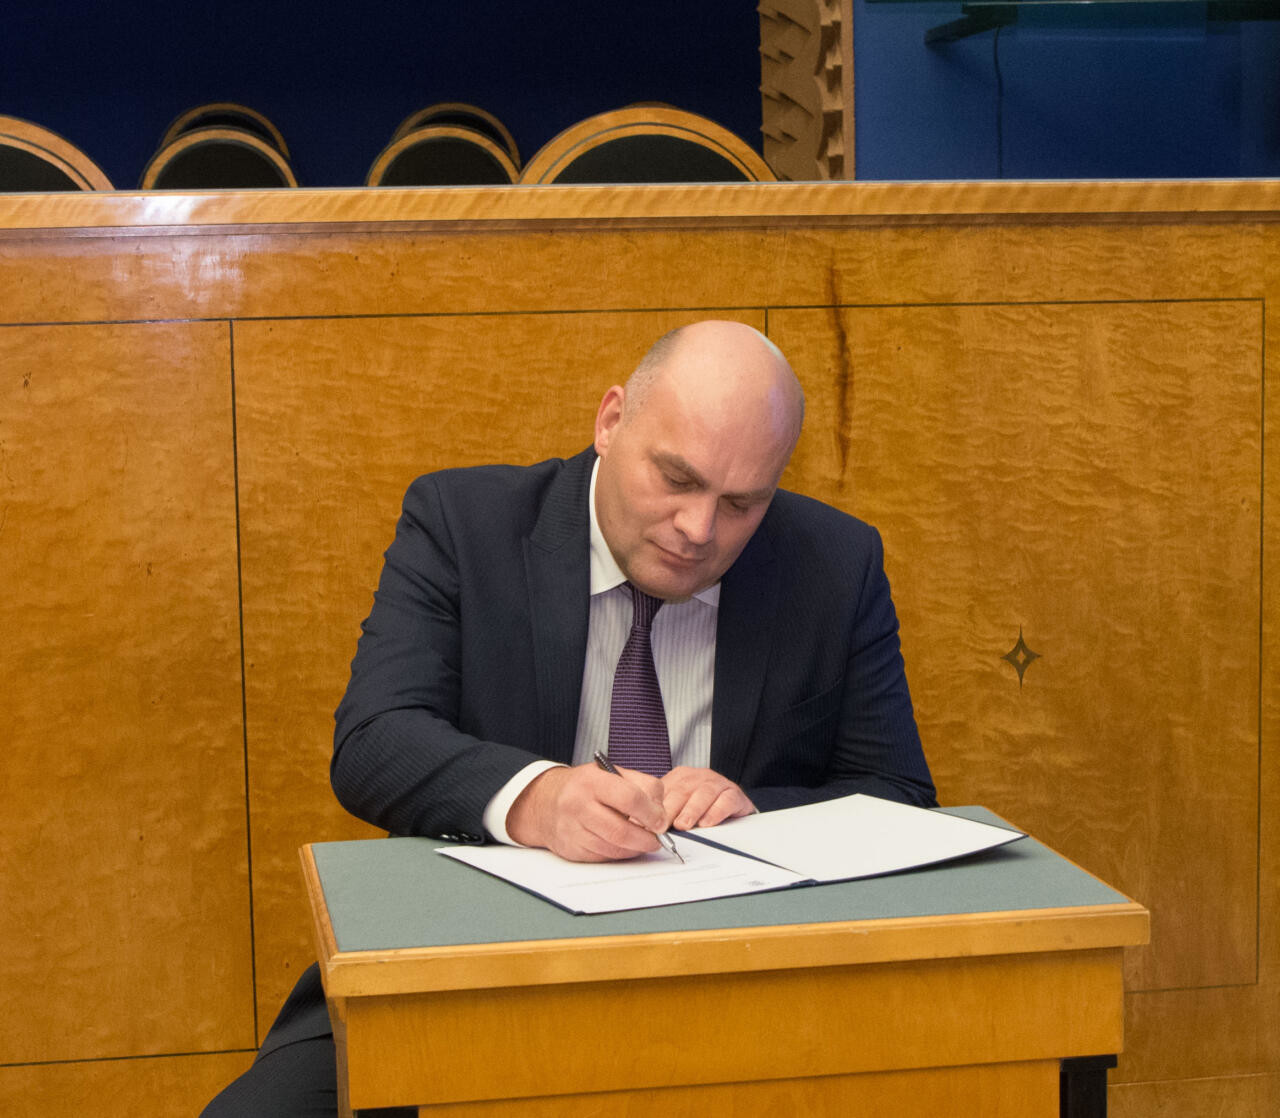 Politsei ei kavatsegi alustada Kravtšenko ülbitsemise kohta menetlust